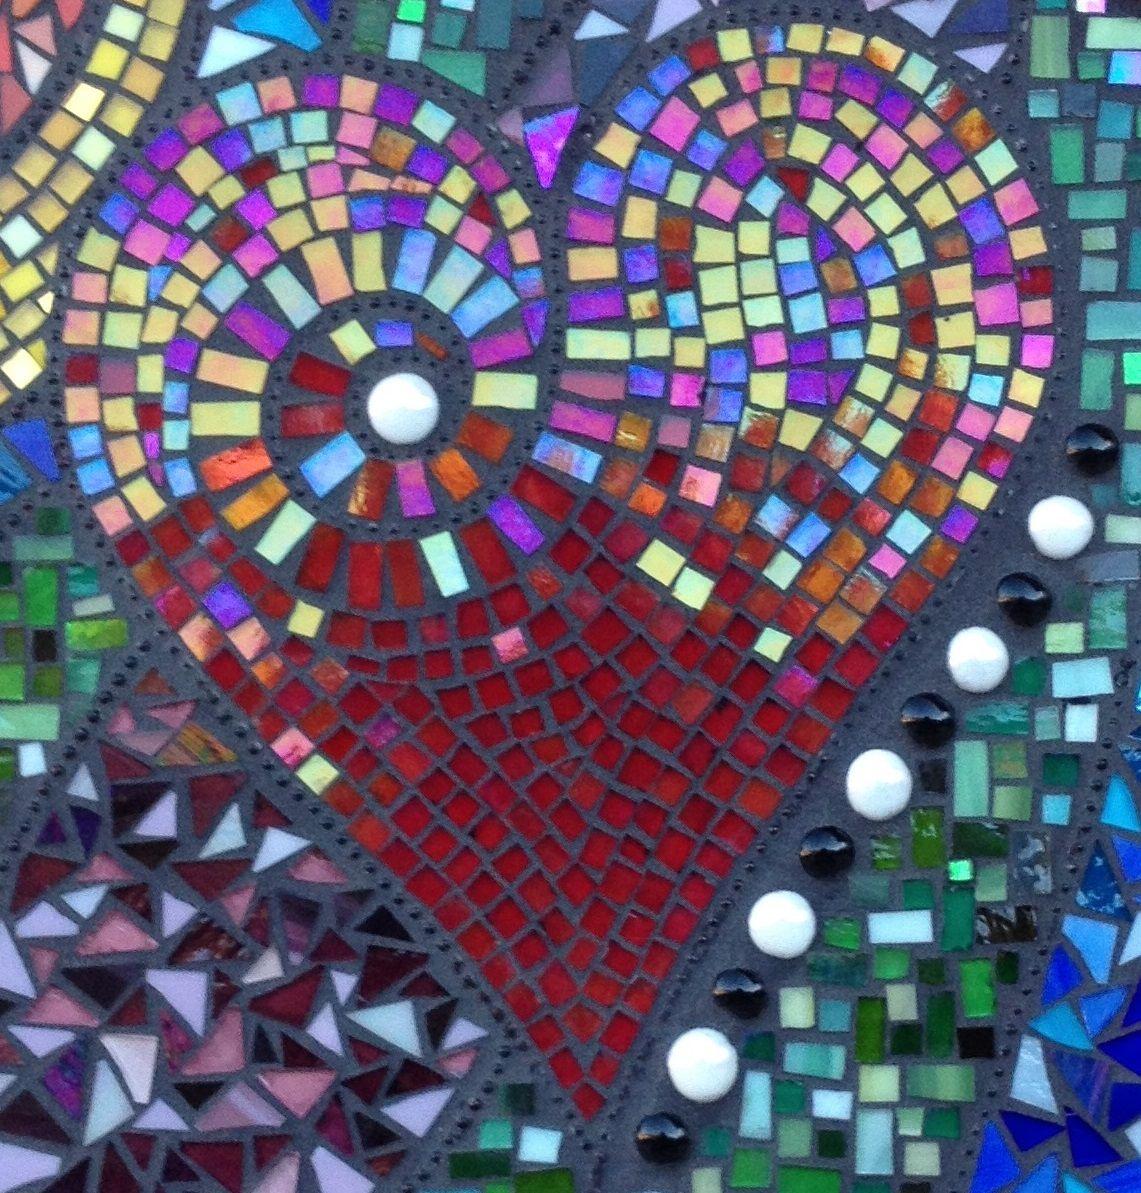 Free Online Mosaic Art Beginners Guide Mosaics Crafts Patterns